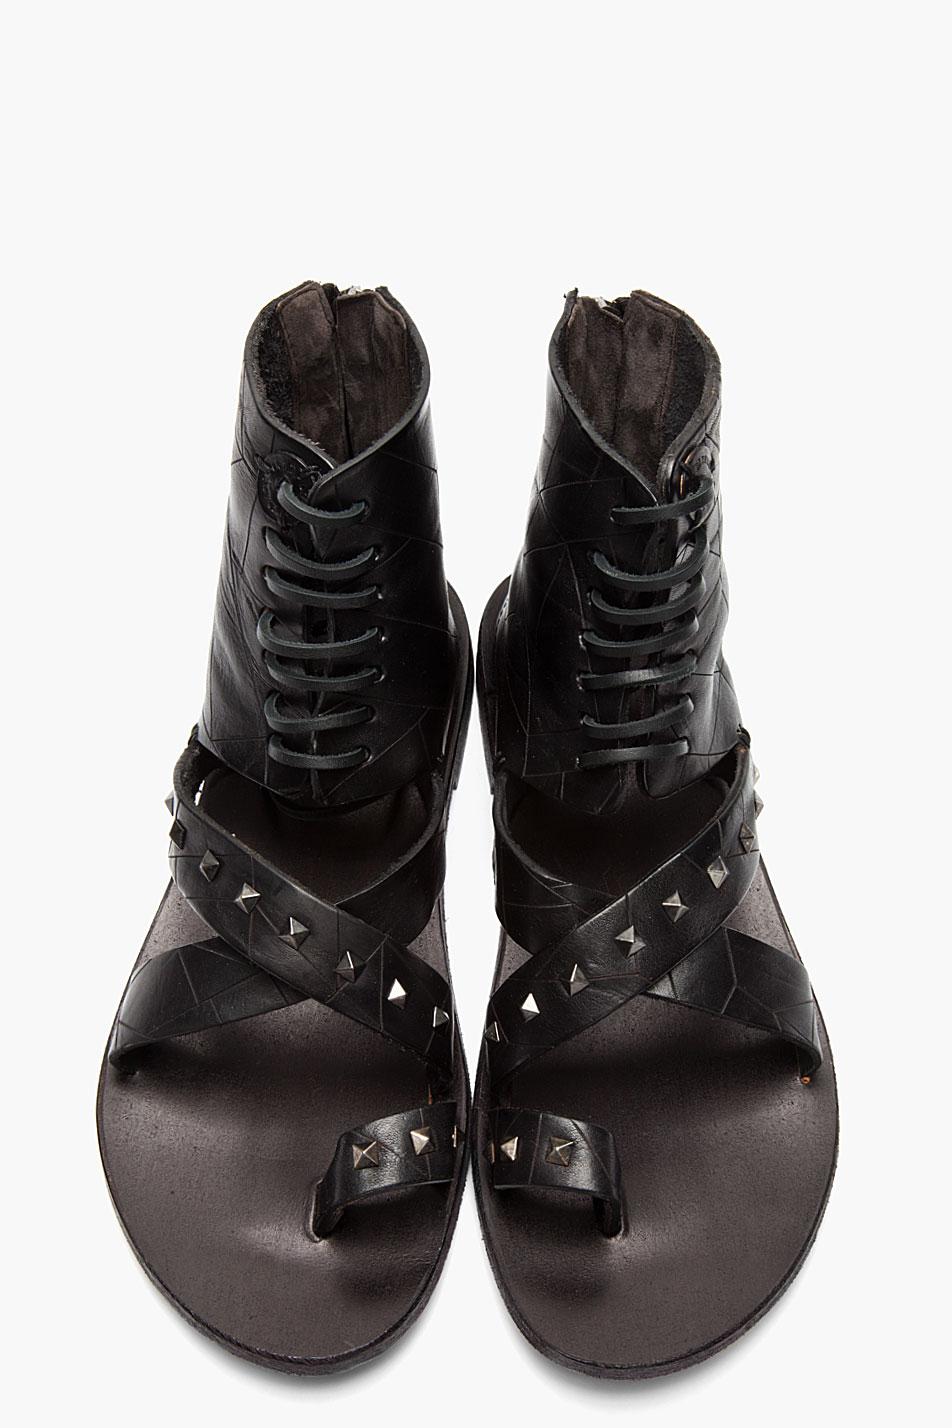 Lyst Diesel Black Gold Black Studded Leather Anibal H